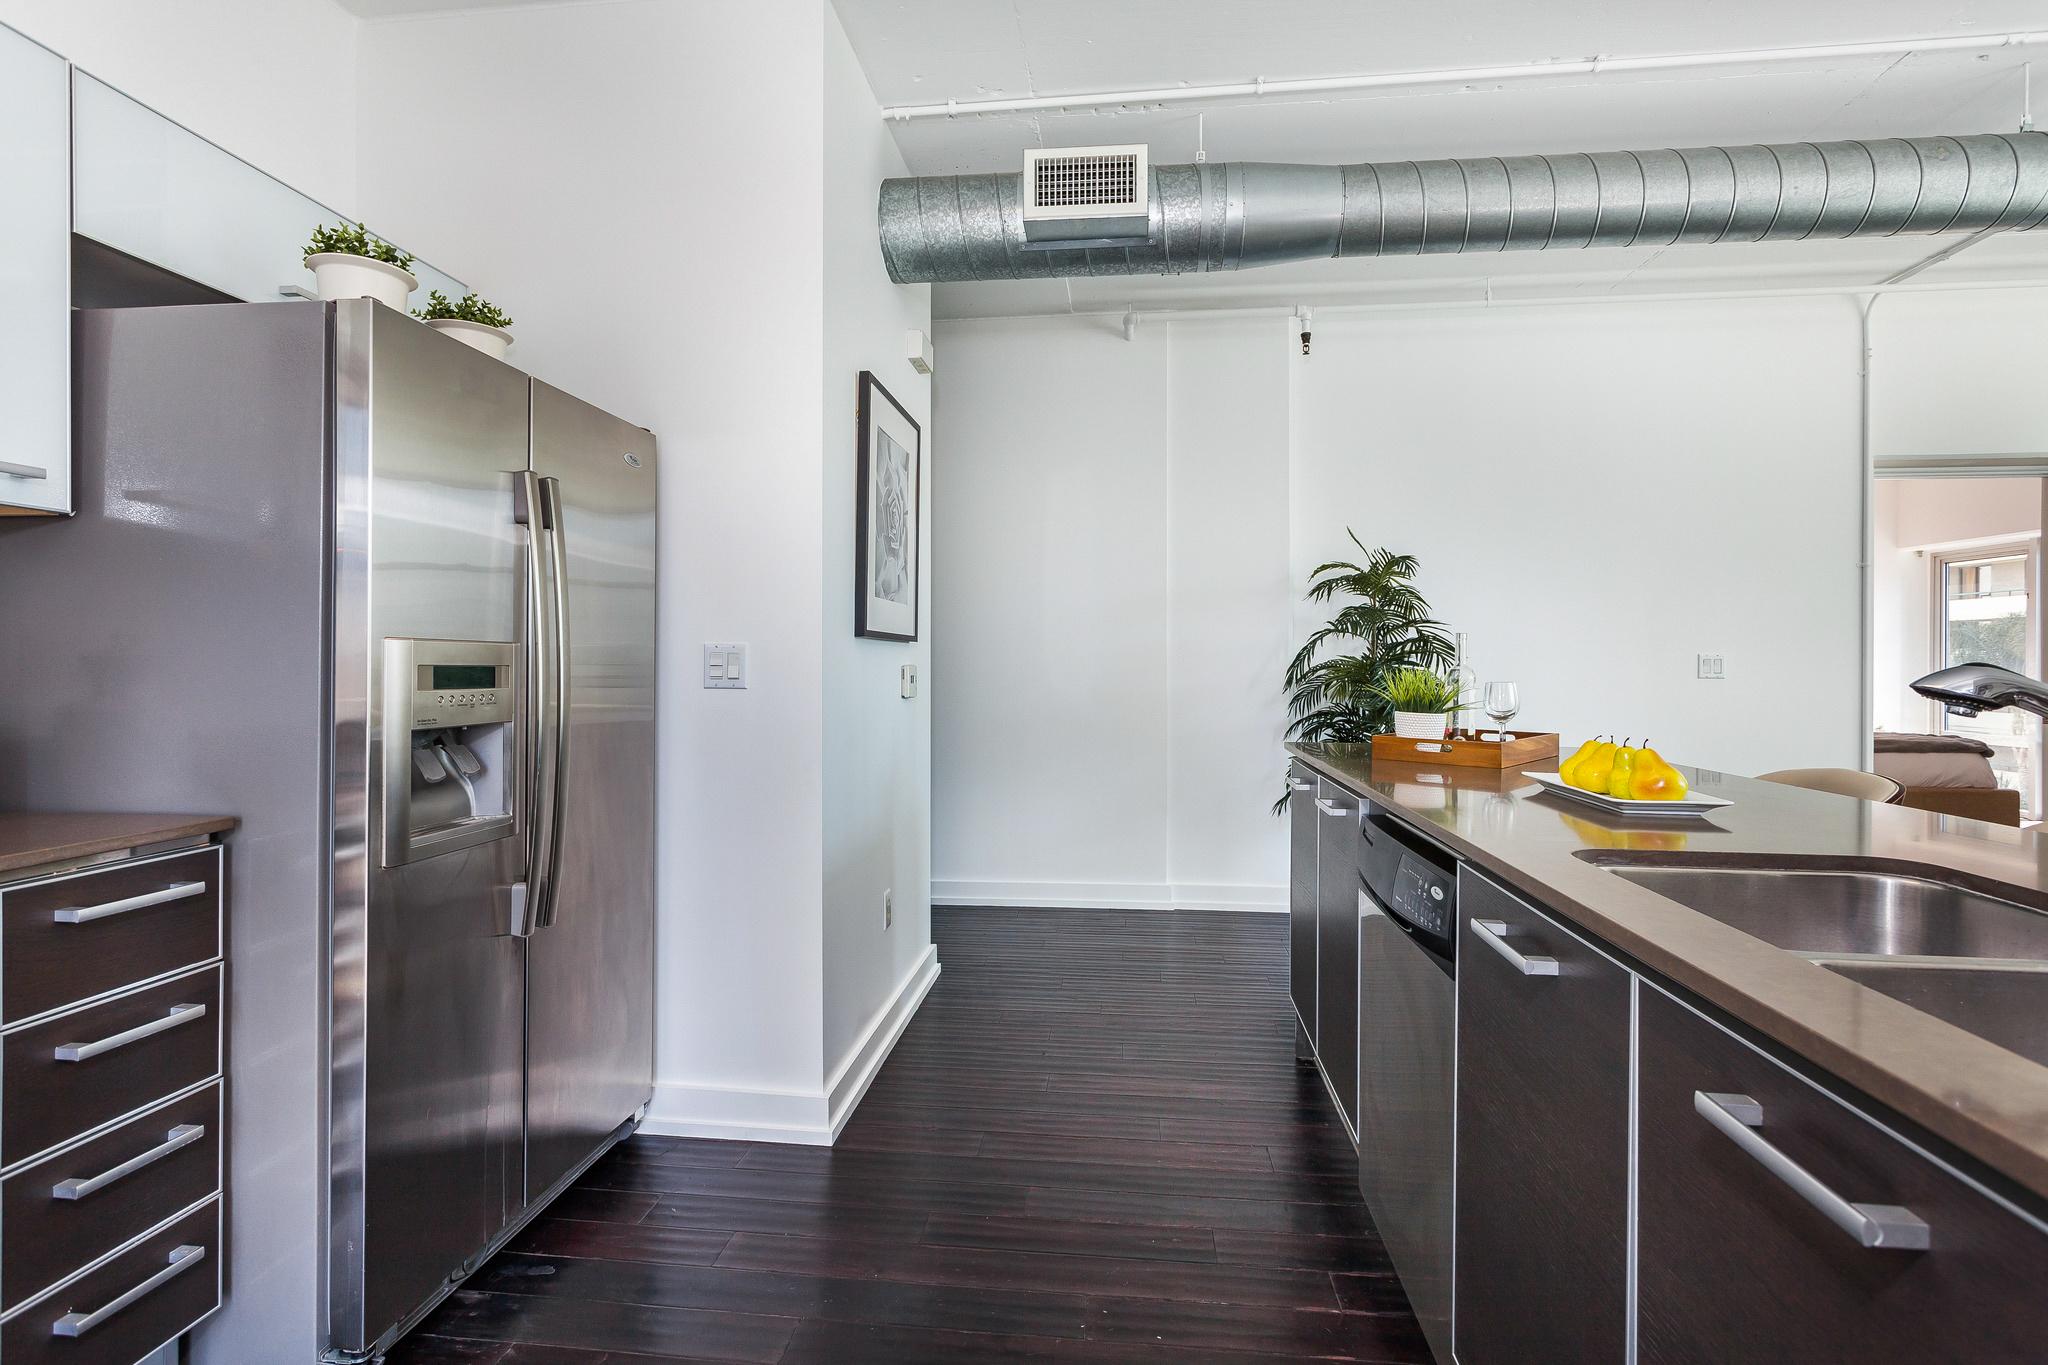 detail view of kitchen